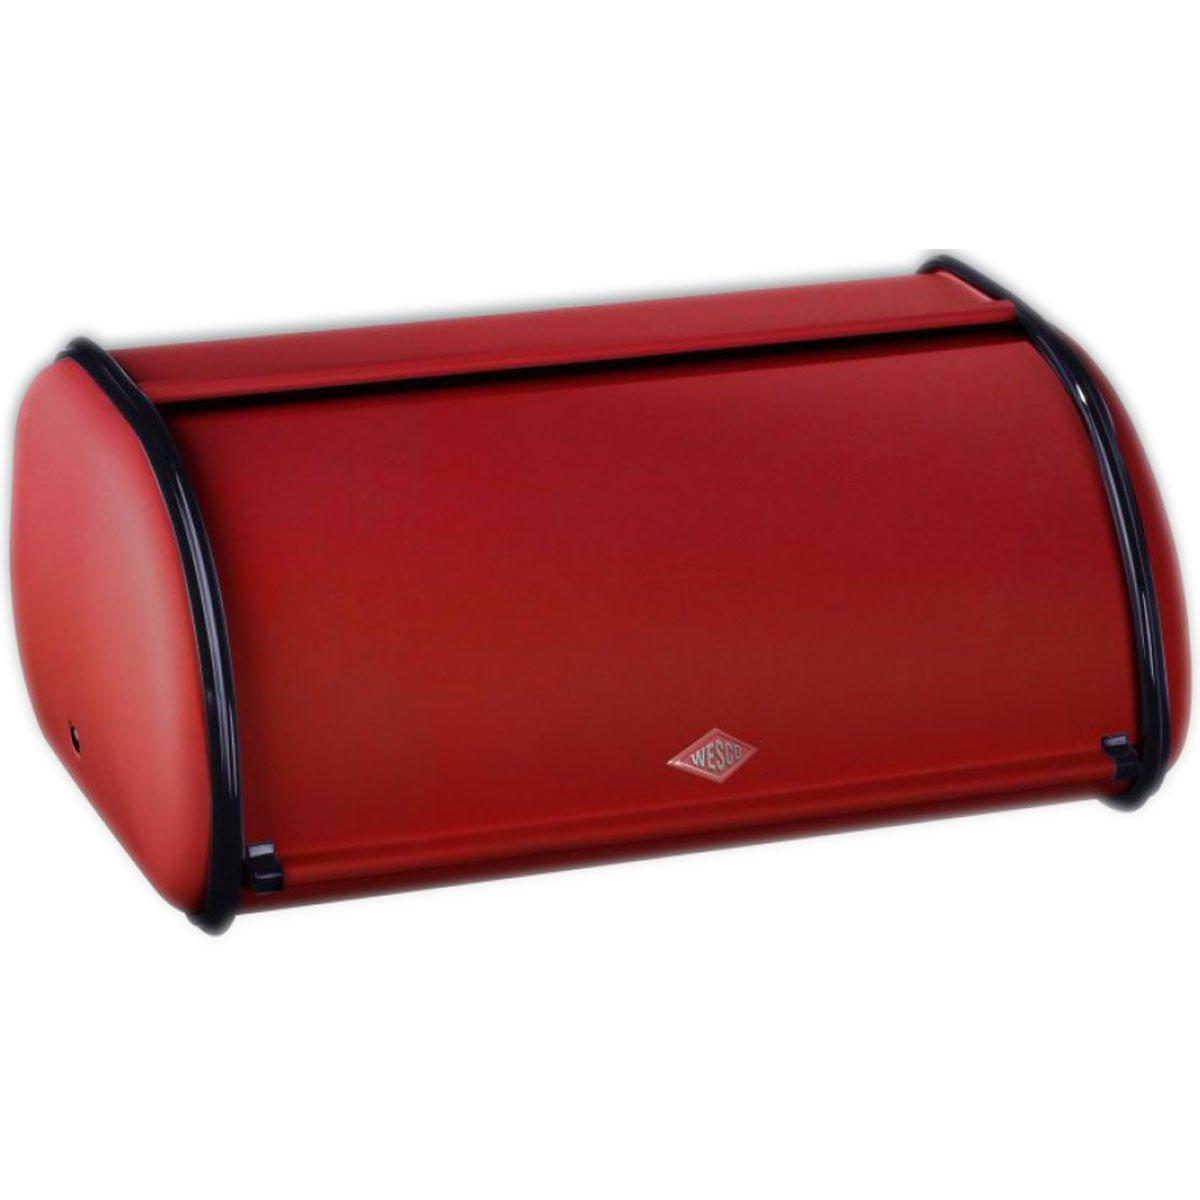 Wesco 212 101-02 - Panera pequeña, color rojo product image